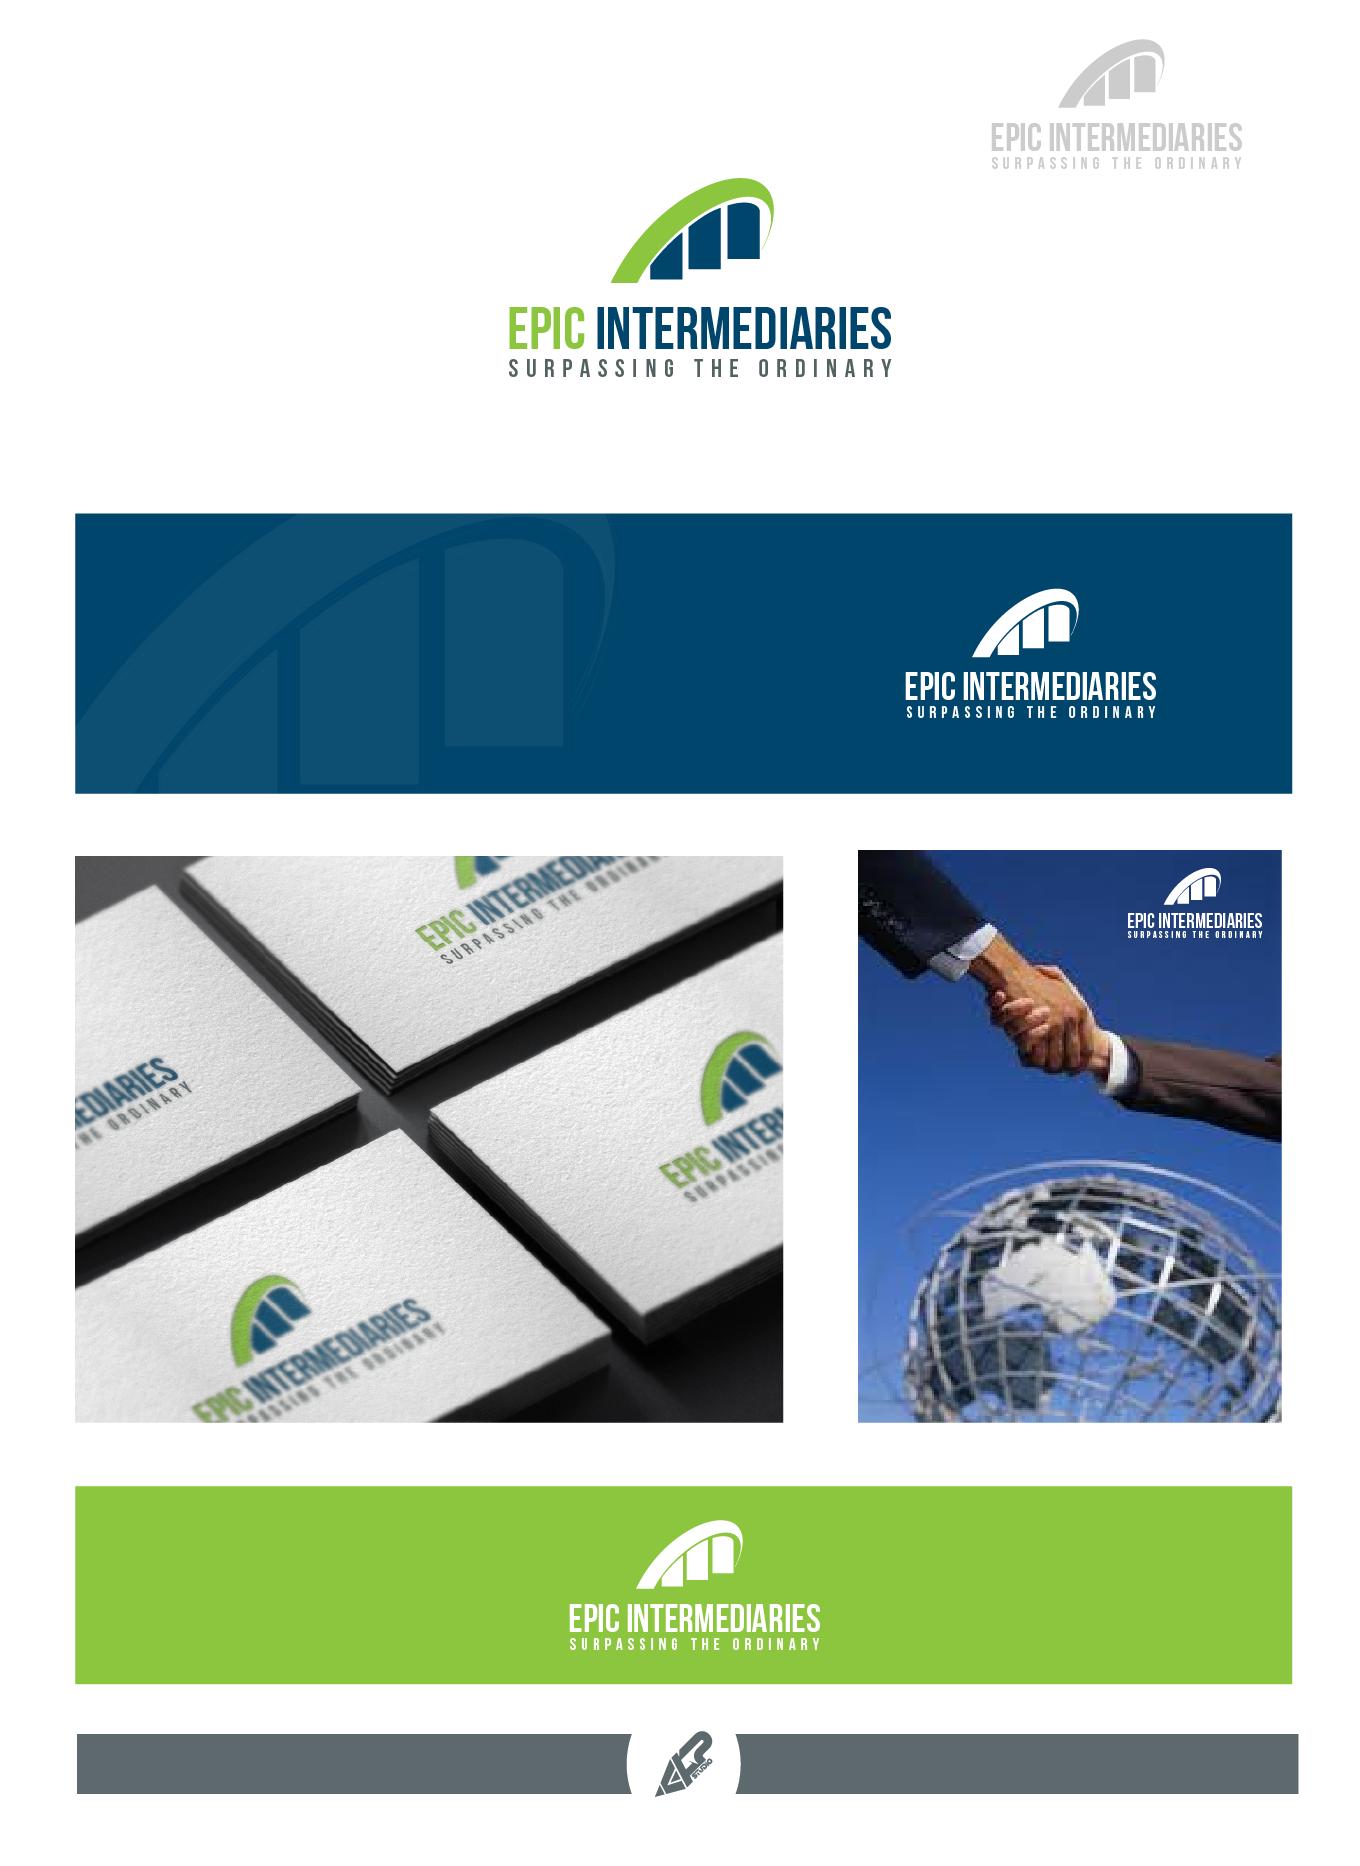 epic intermediaries needs a new logo